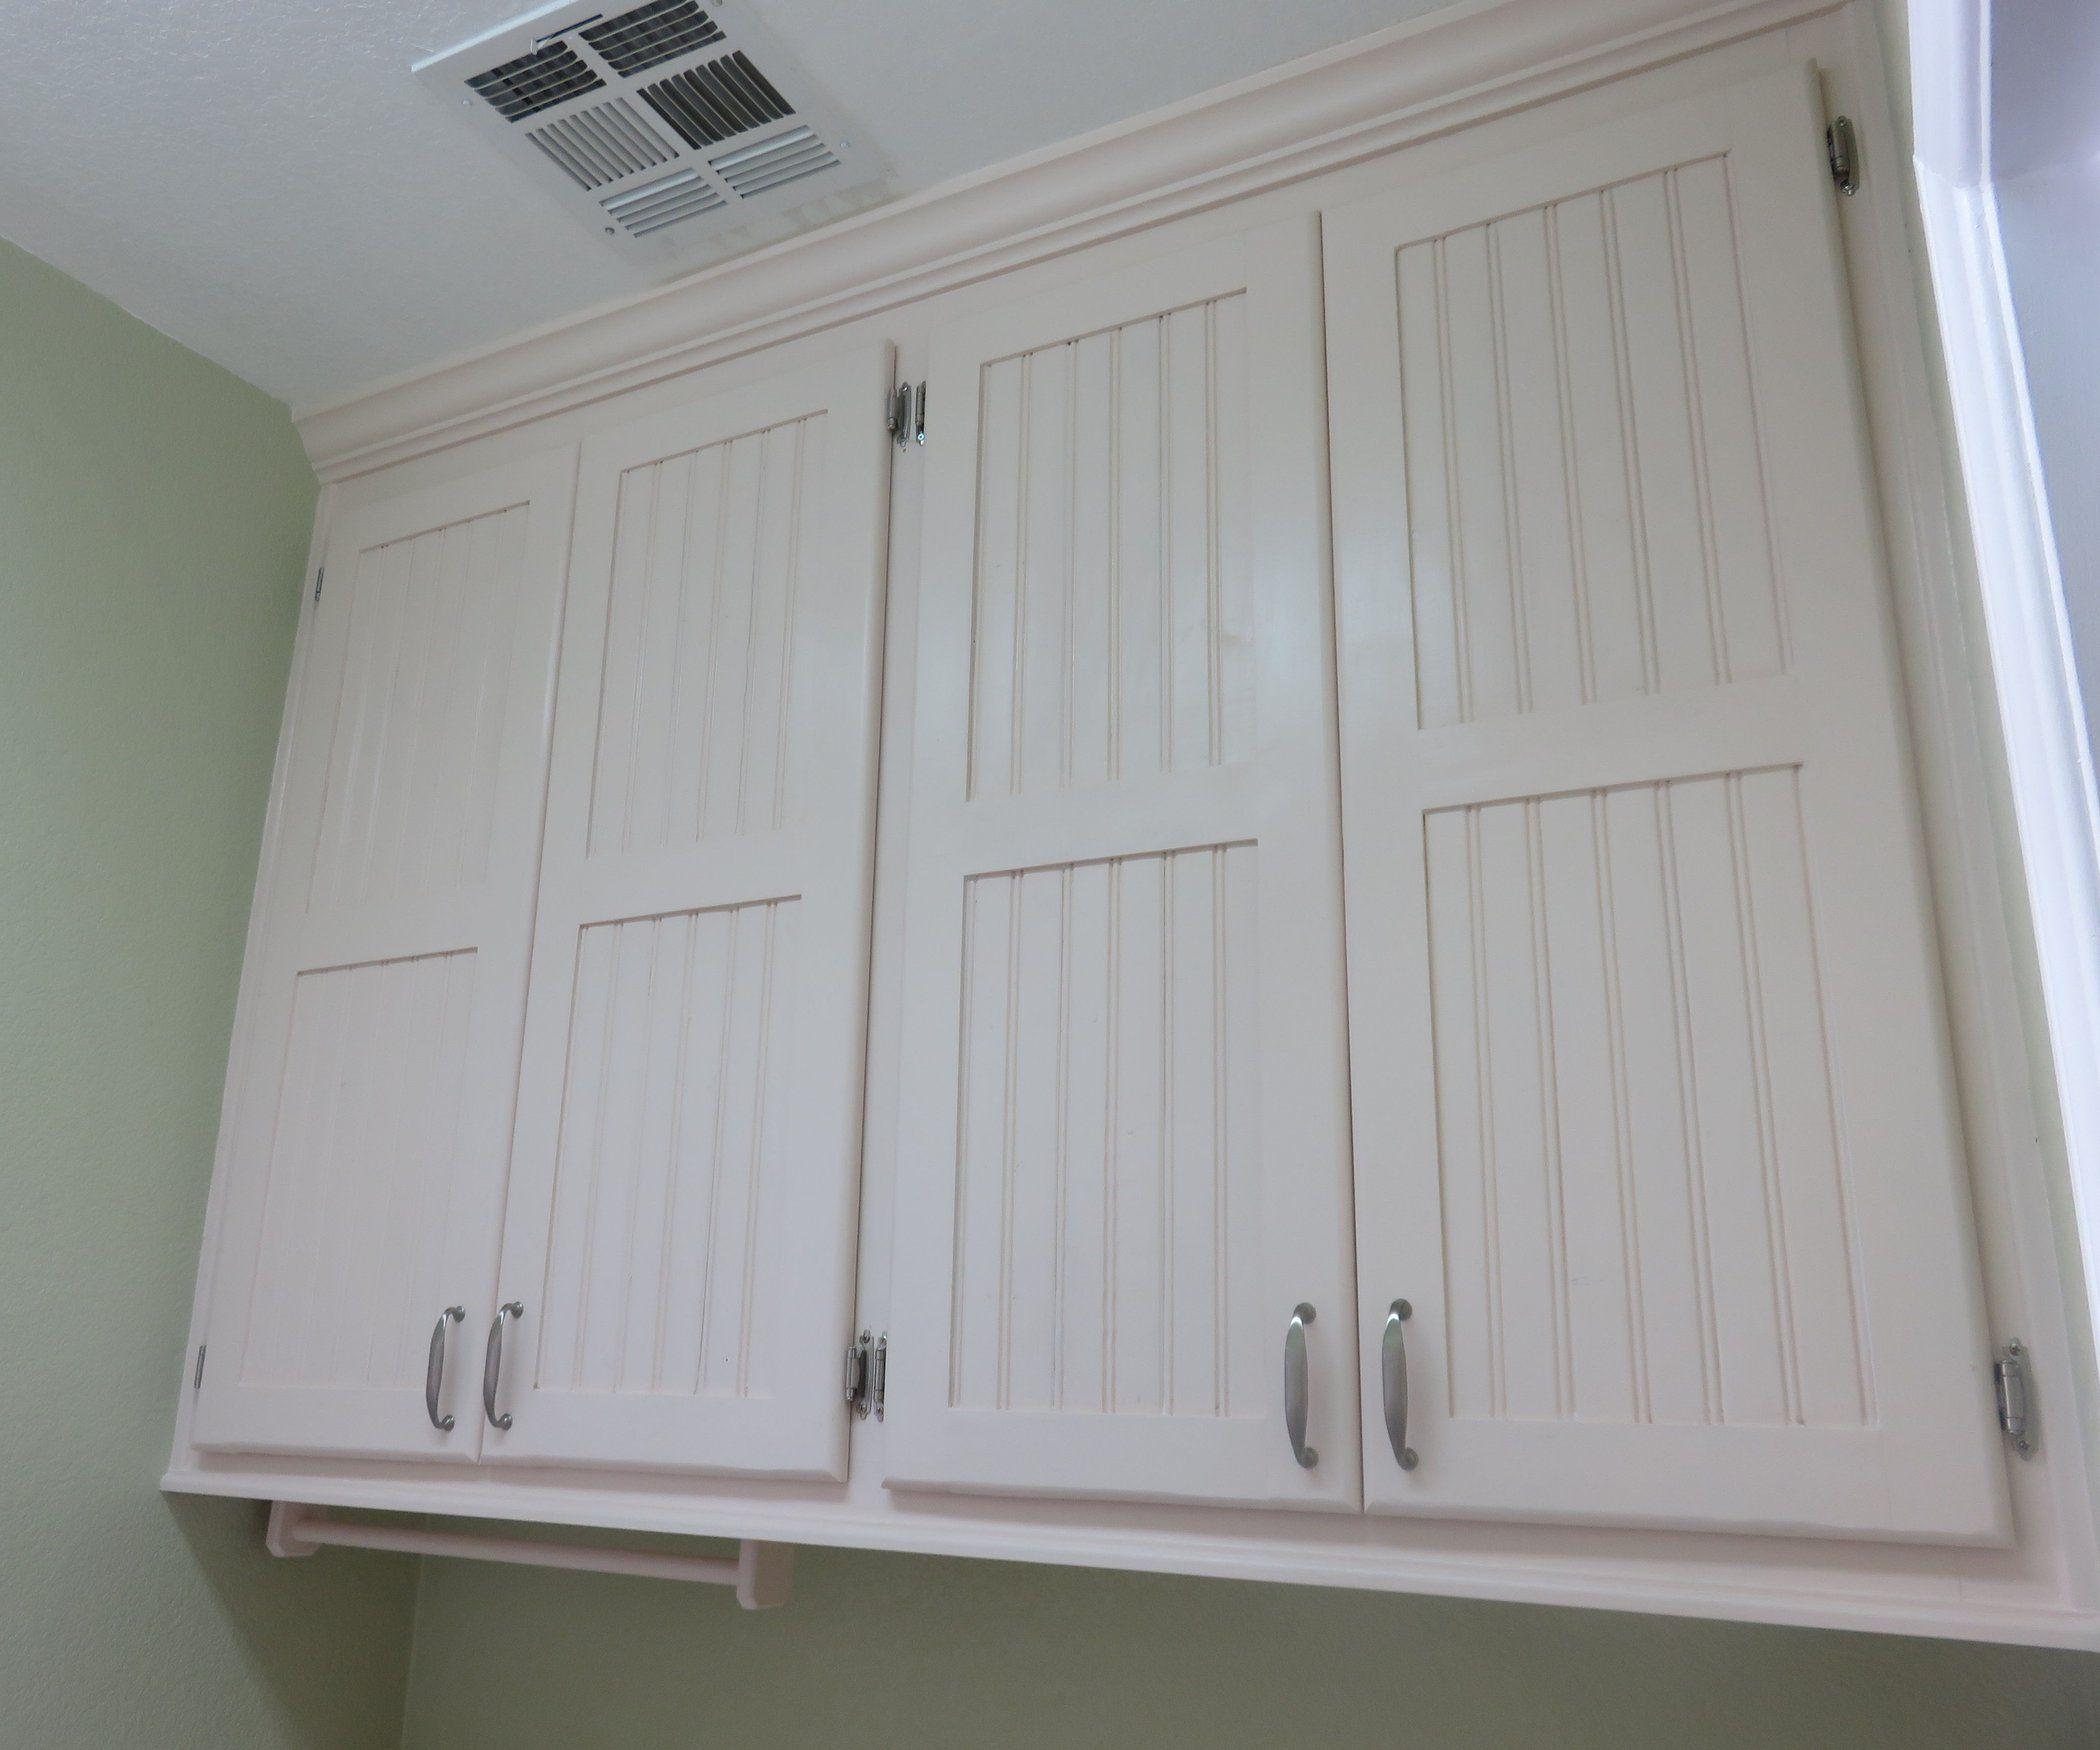 Laundry Room Cabinets Diy Laundry Room Diy Diy Laundry Room